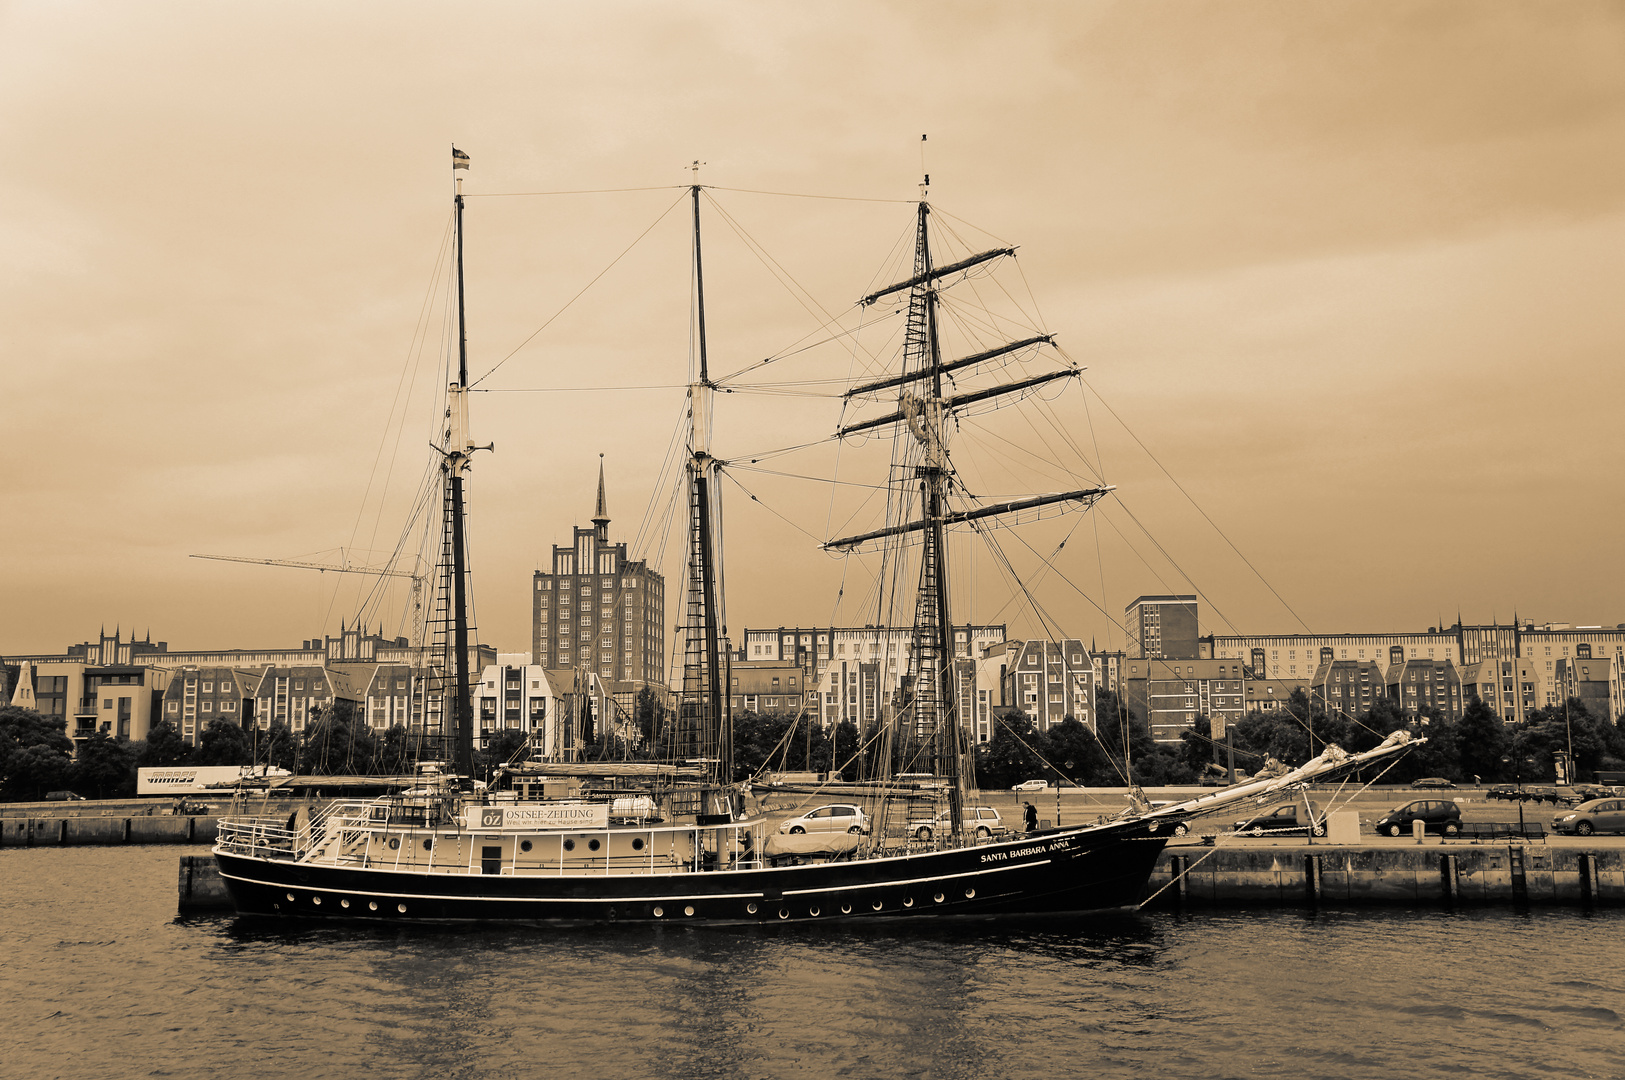 Santa Barbara Anna (Stadthafen Rostock)